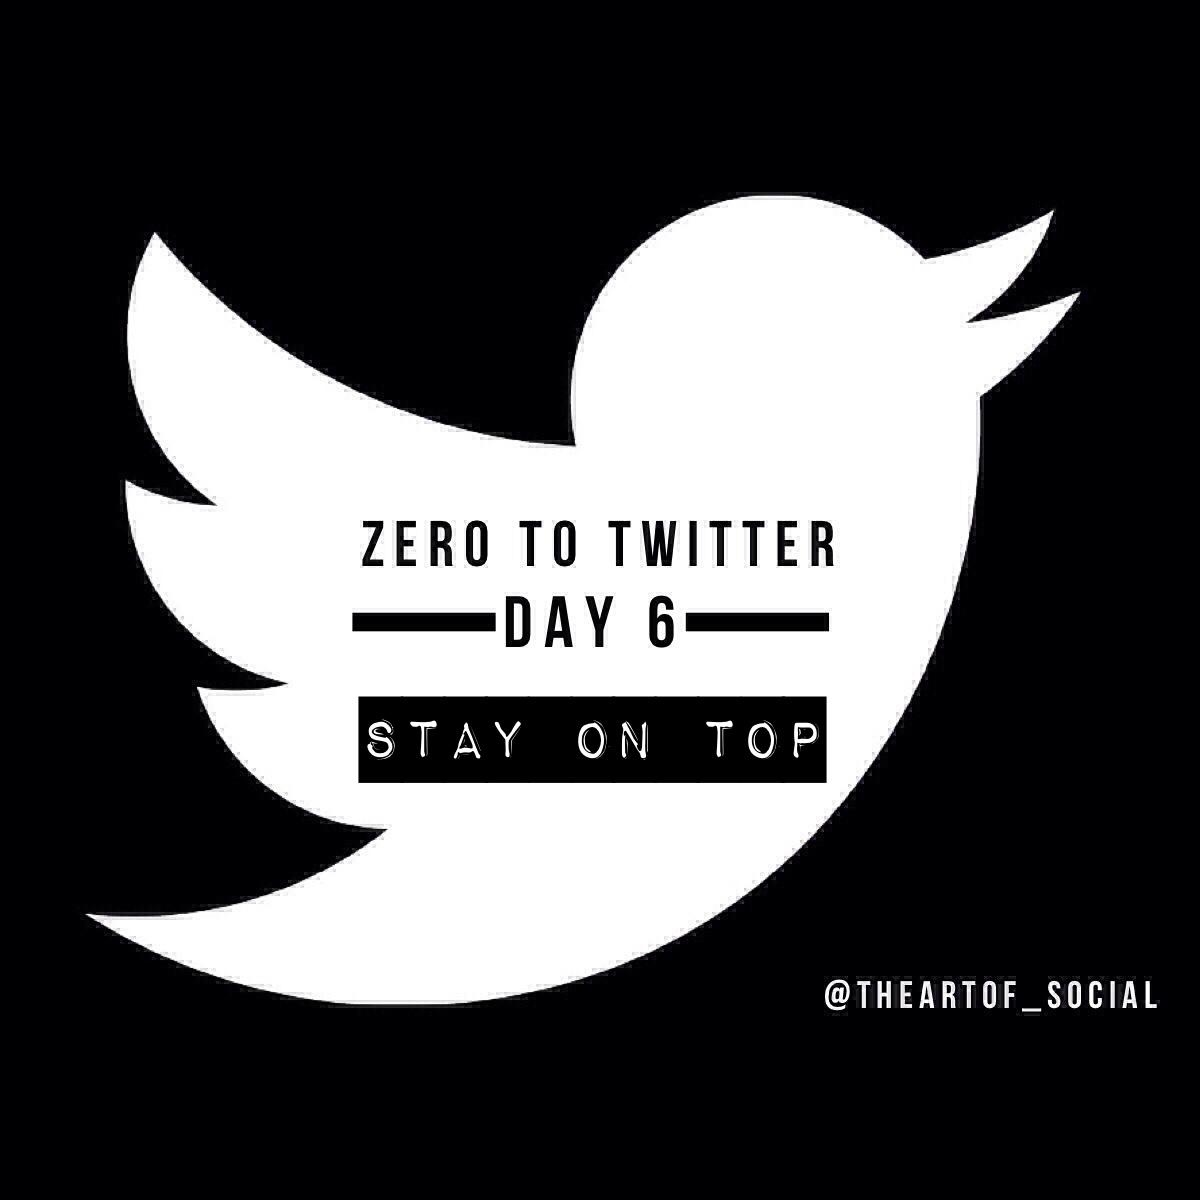 ZeroToTwitterDay6_StayOnTop.jpg